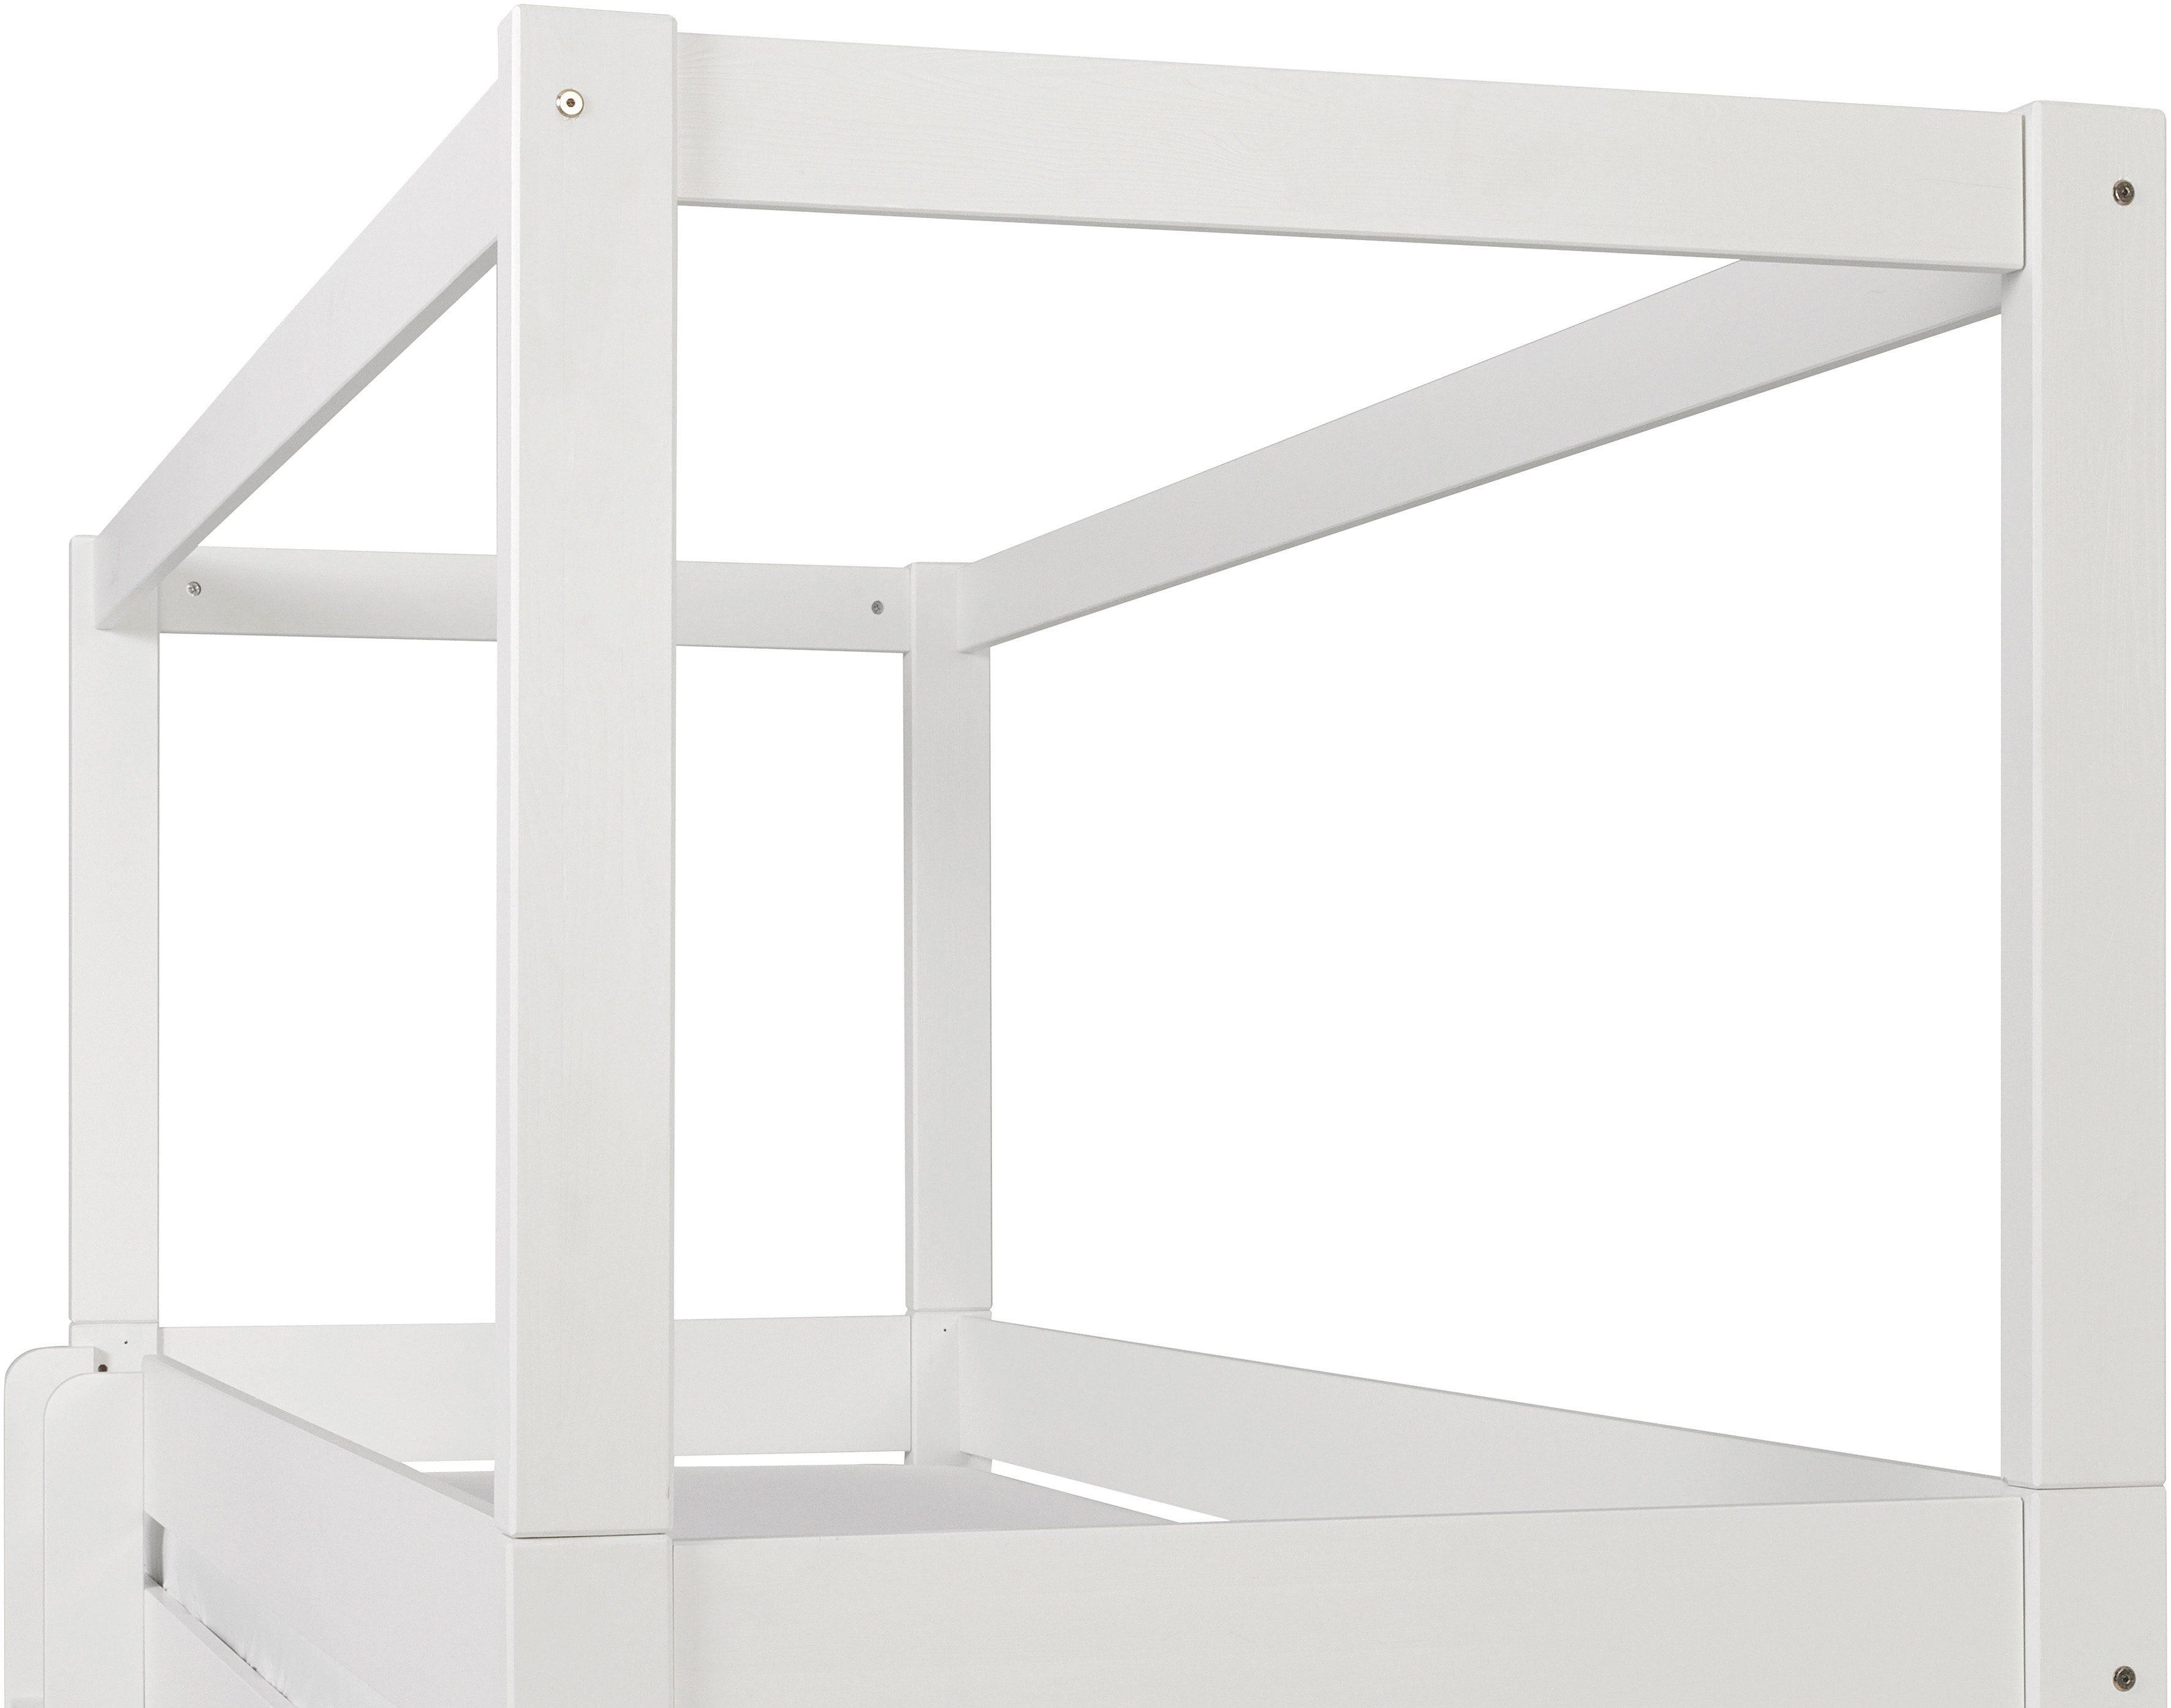 bett himmel bestellen baur. Black Bedroom Furniture Sets. Home Design Ideas